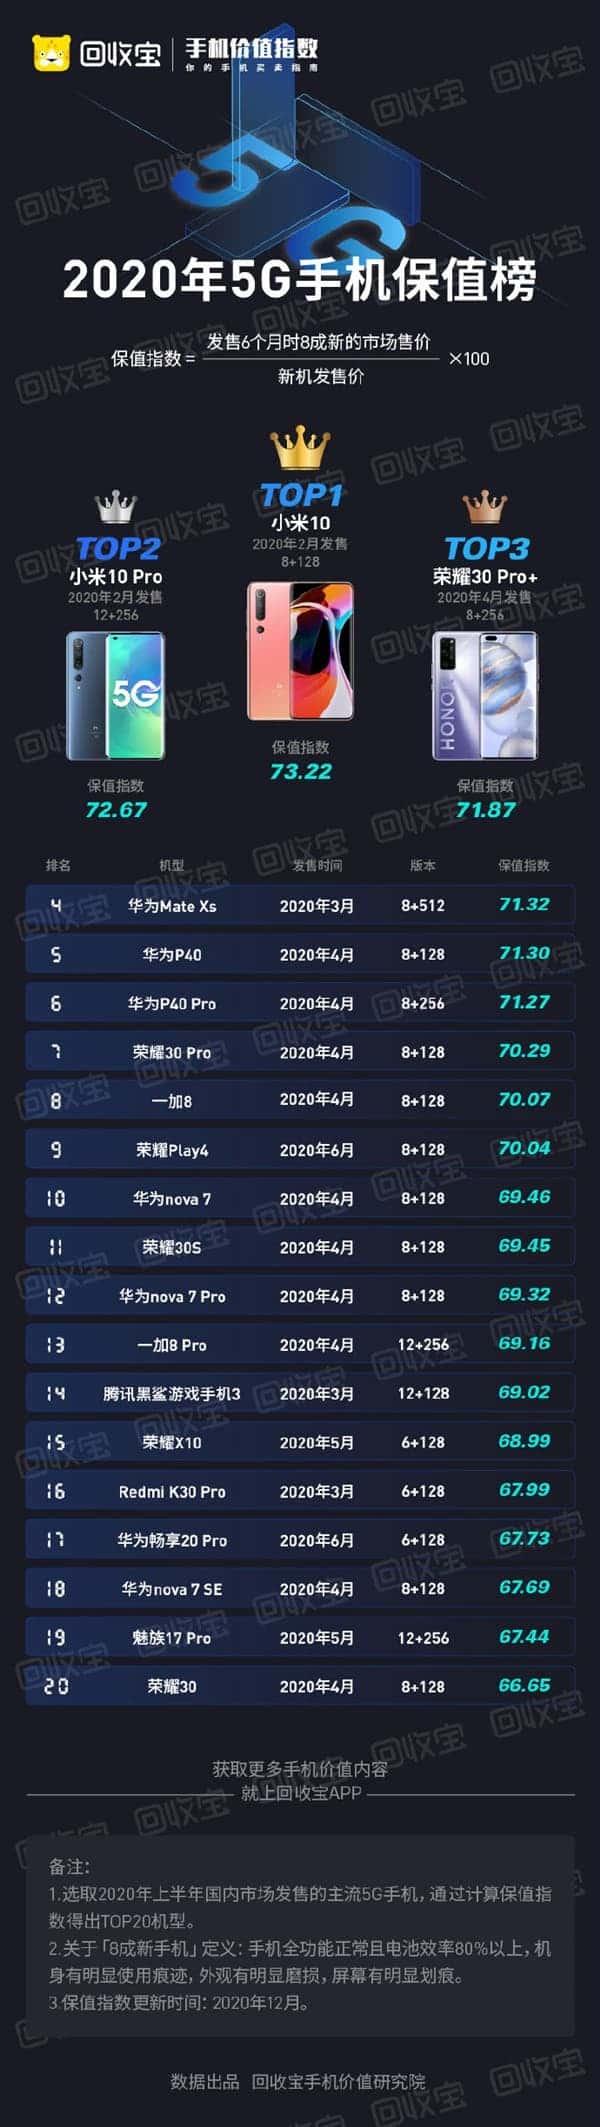 most value preserved 5g smartphone xiaomi mi 10